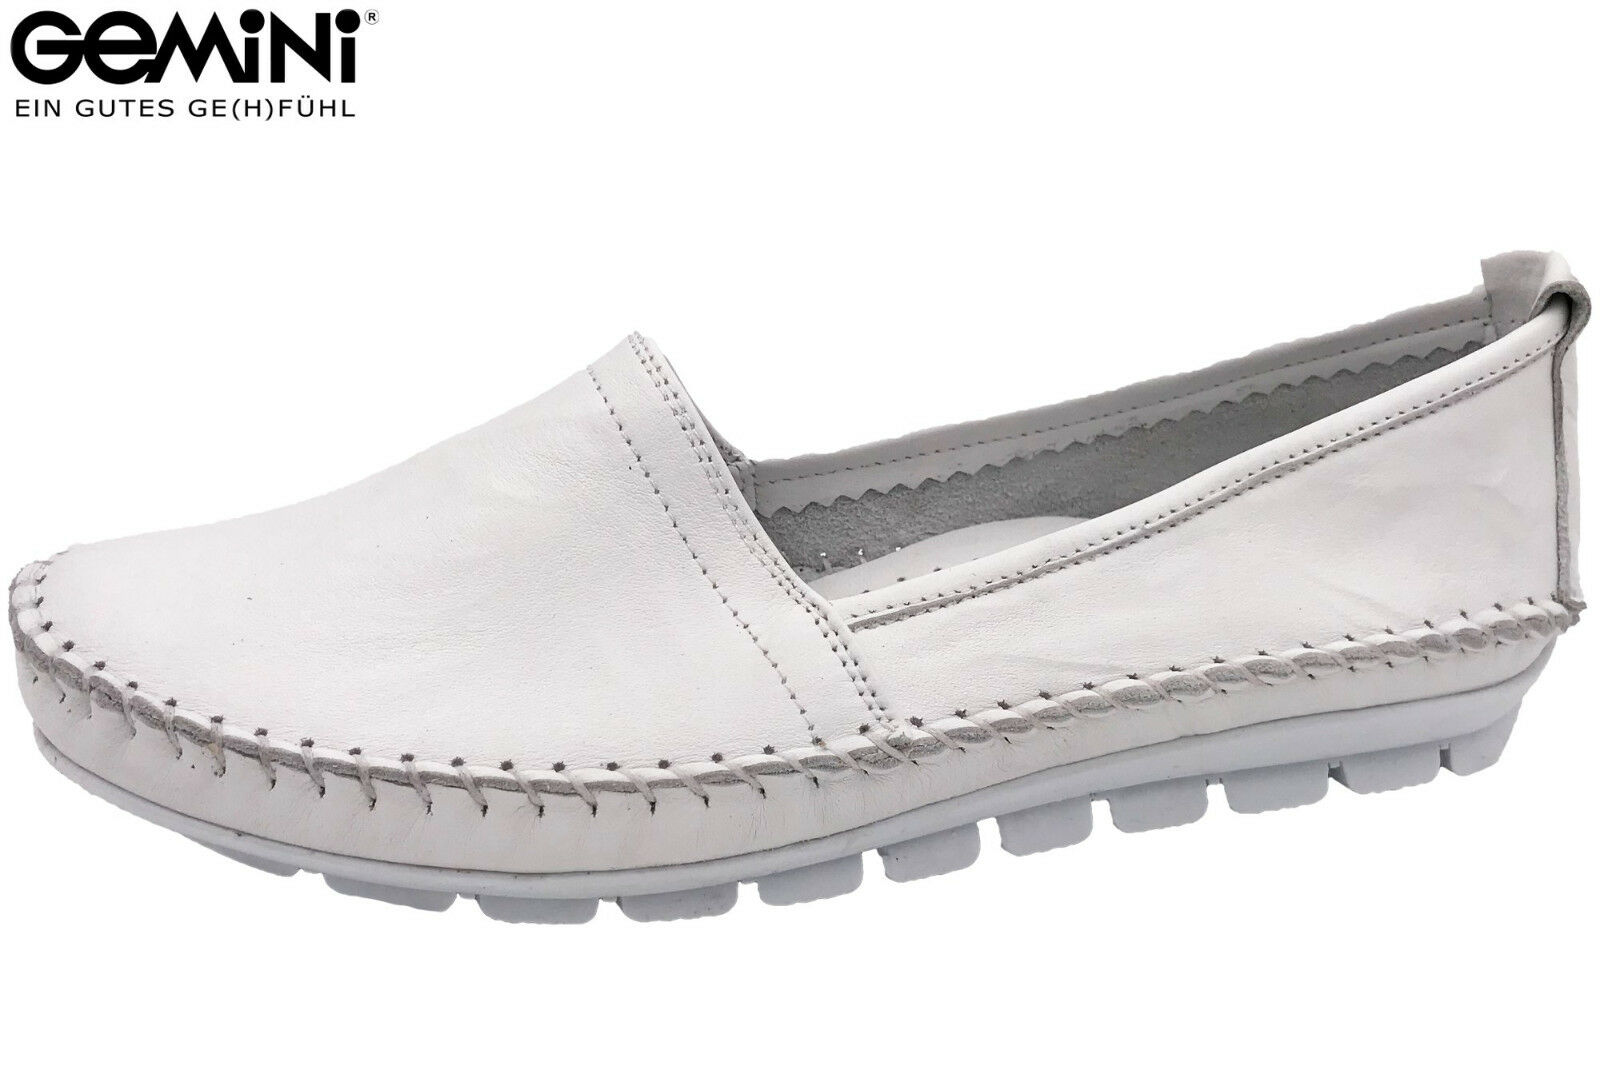 Gemini Damen Slipper Weiß Sommer Schuhe Leder Ballerina 3122-001 NEU